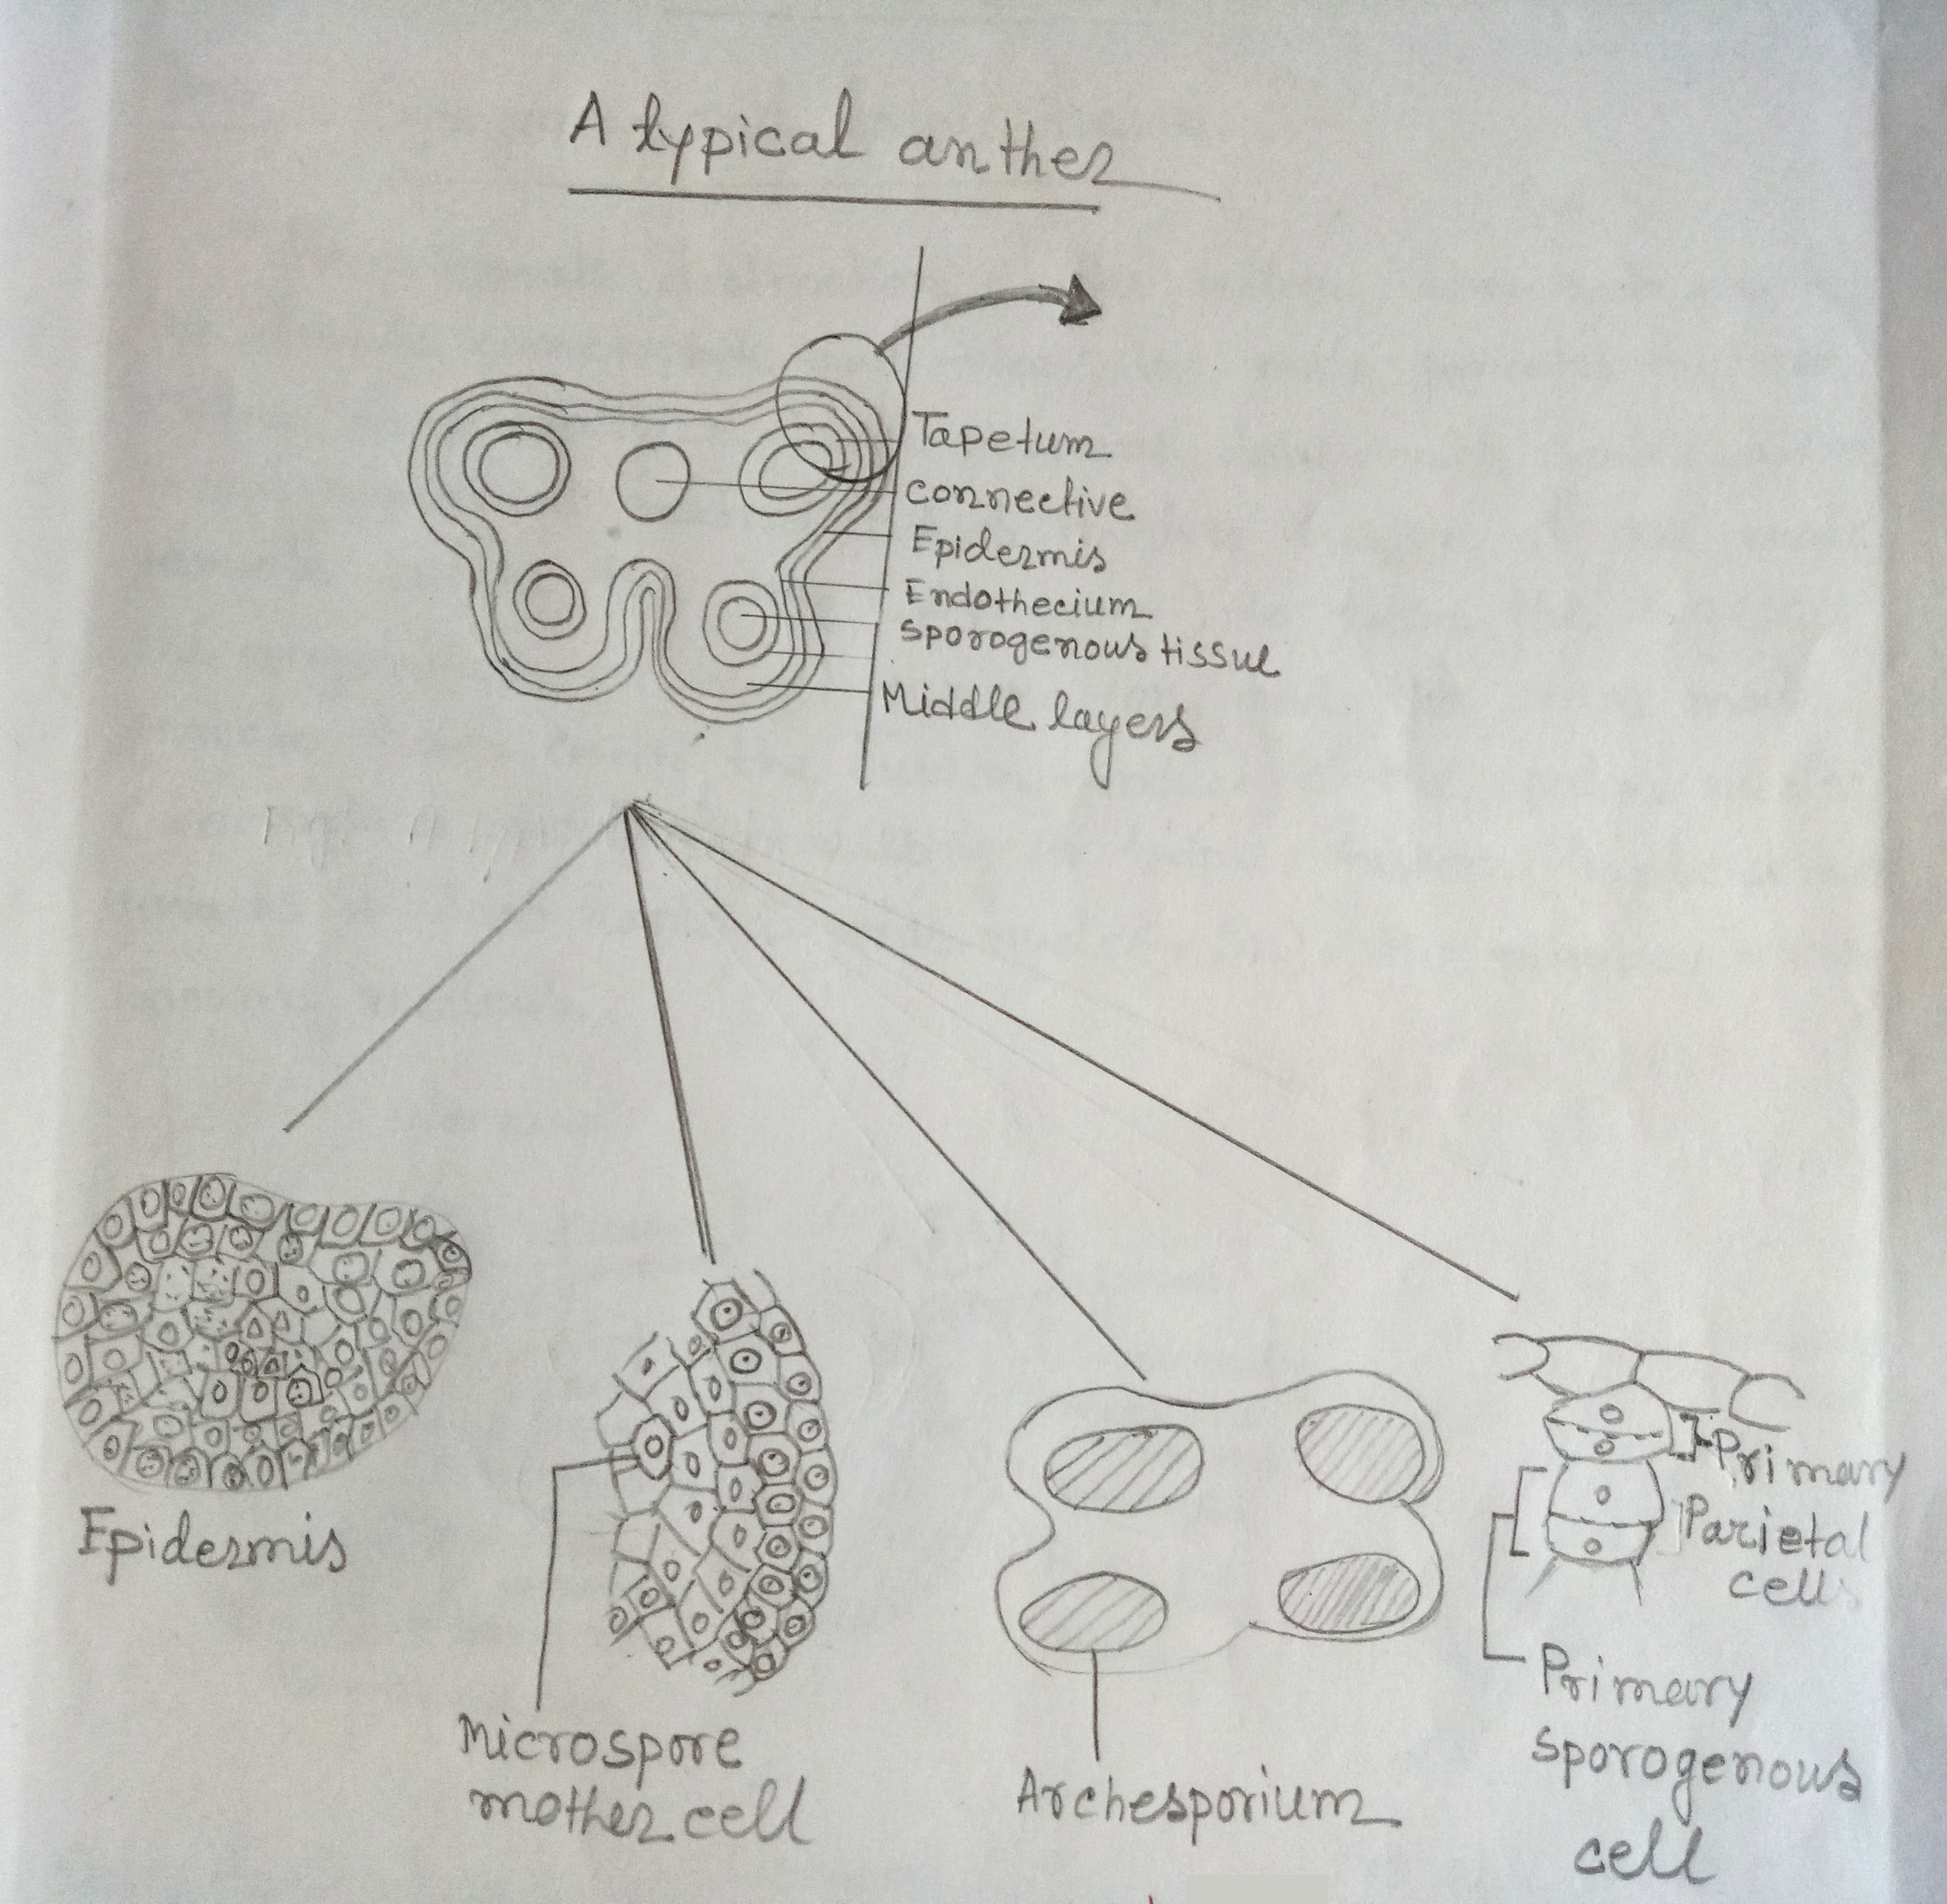 Diagrammatic representation of different stages of development of microsporangium